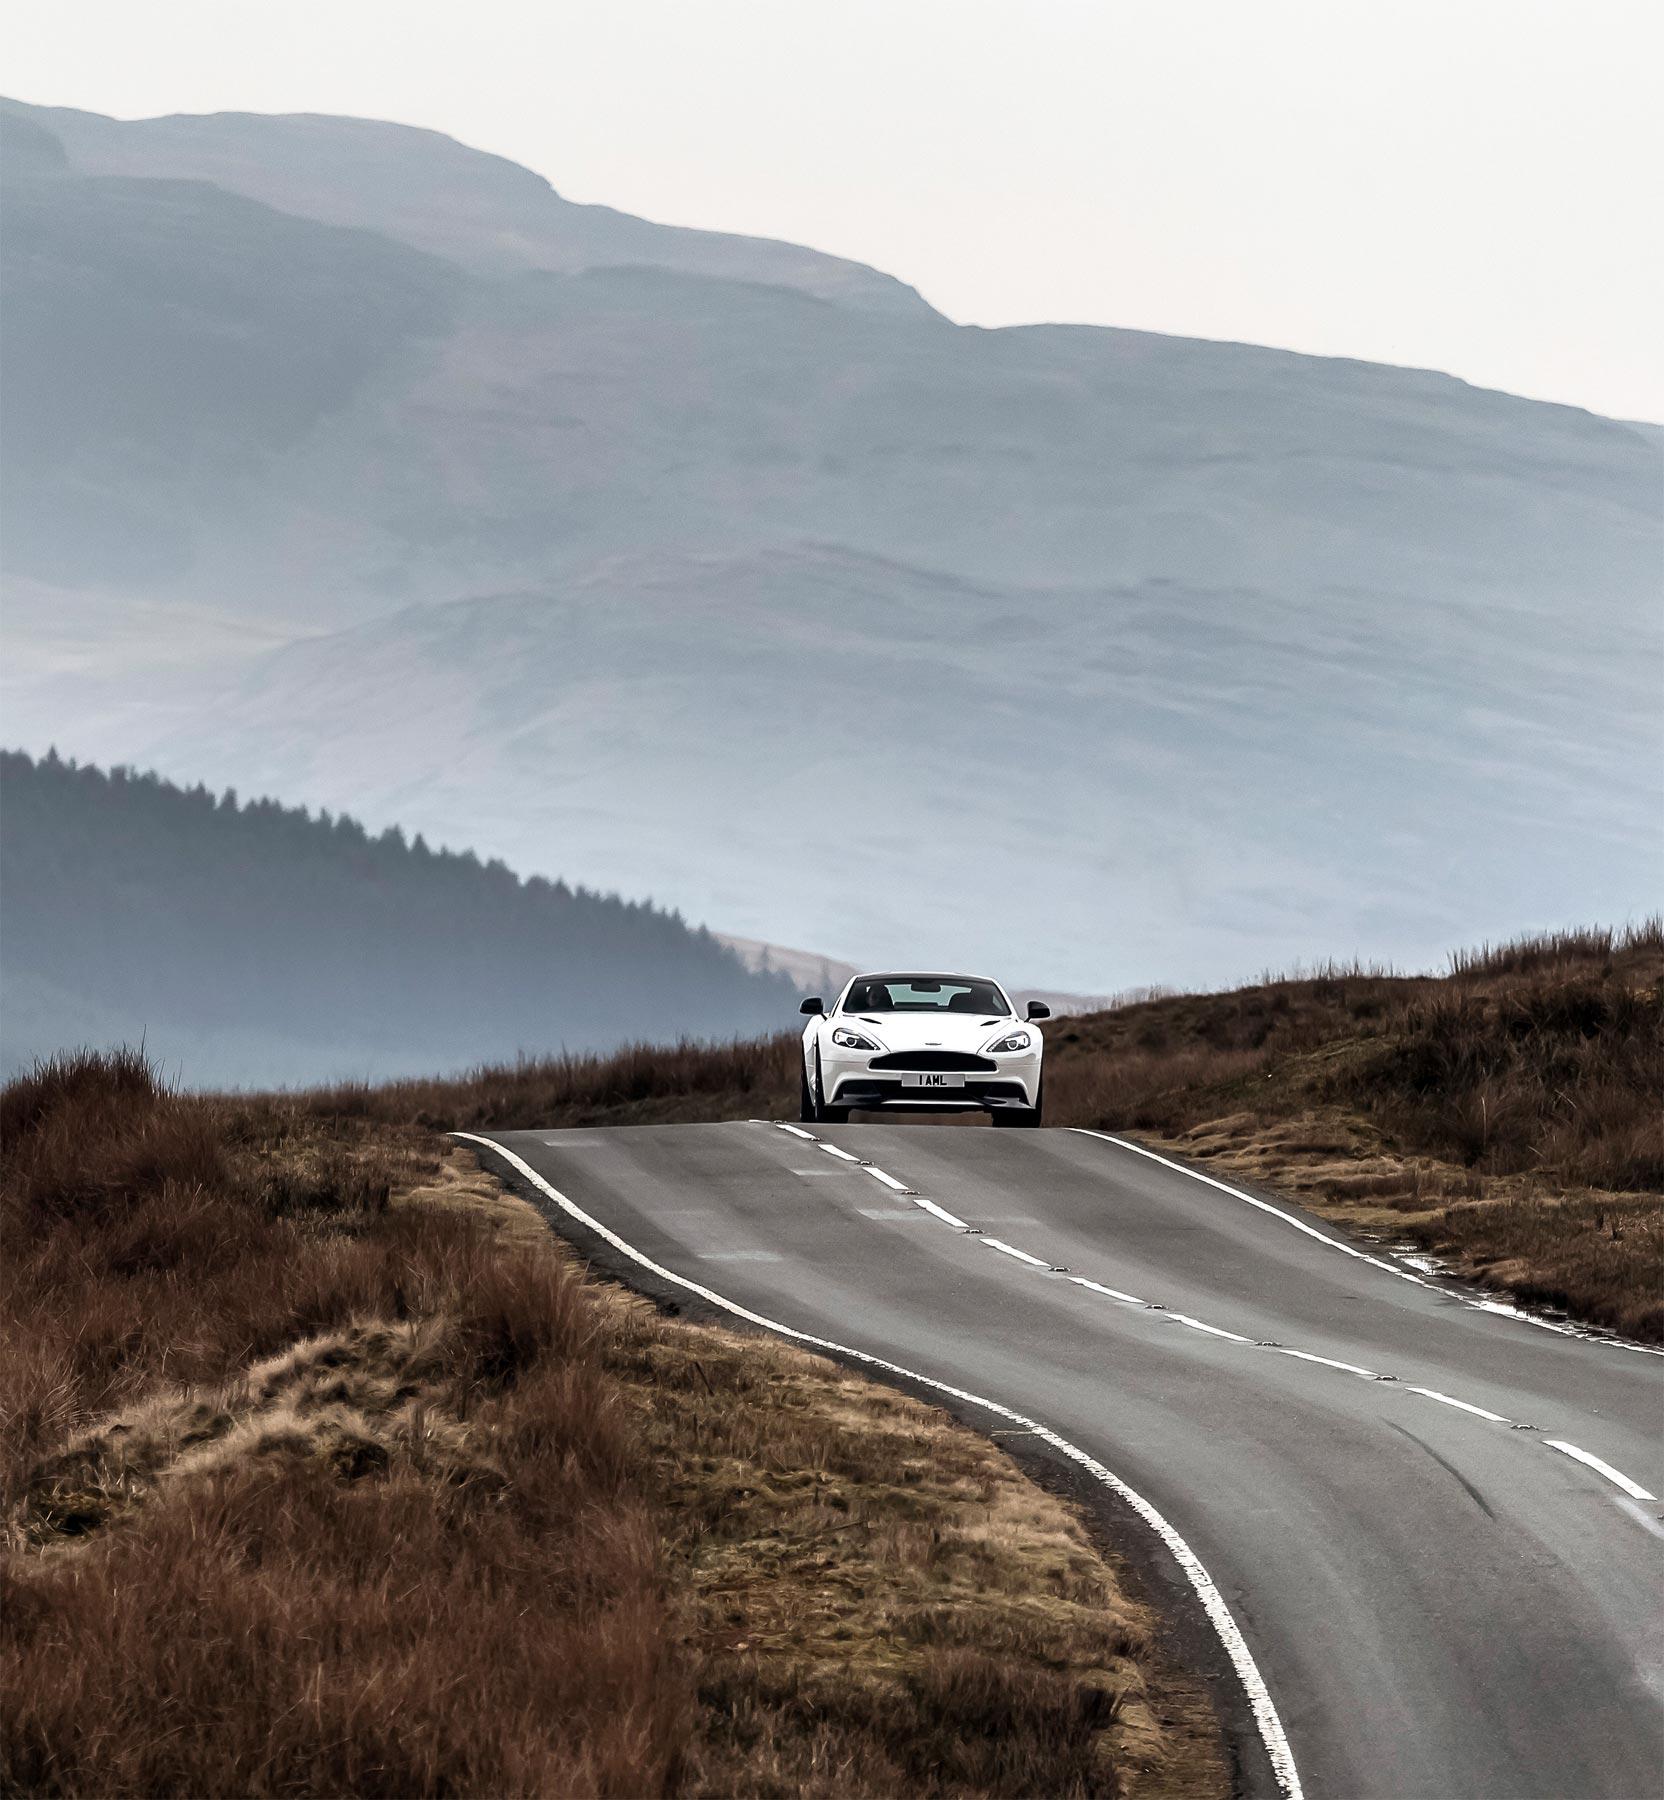 Simon Wittenberg Reviews The Aston Martin Vanquish Volante 1